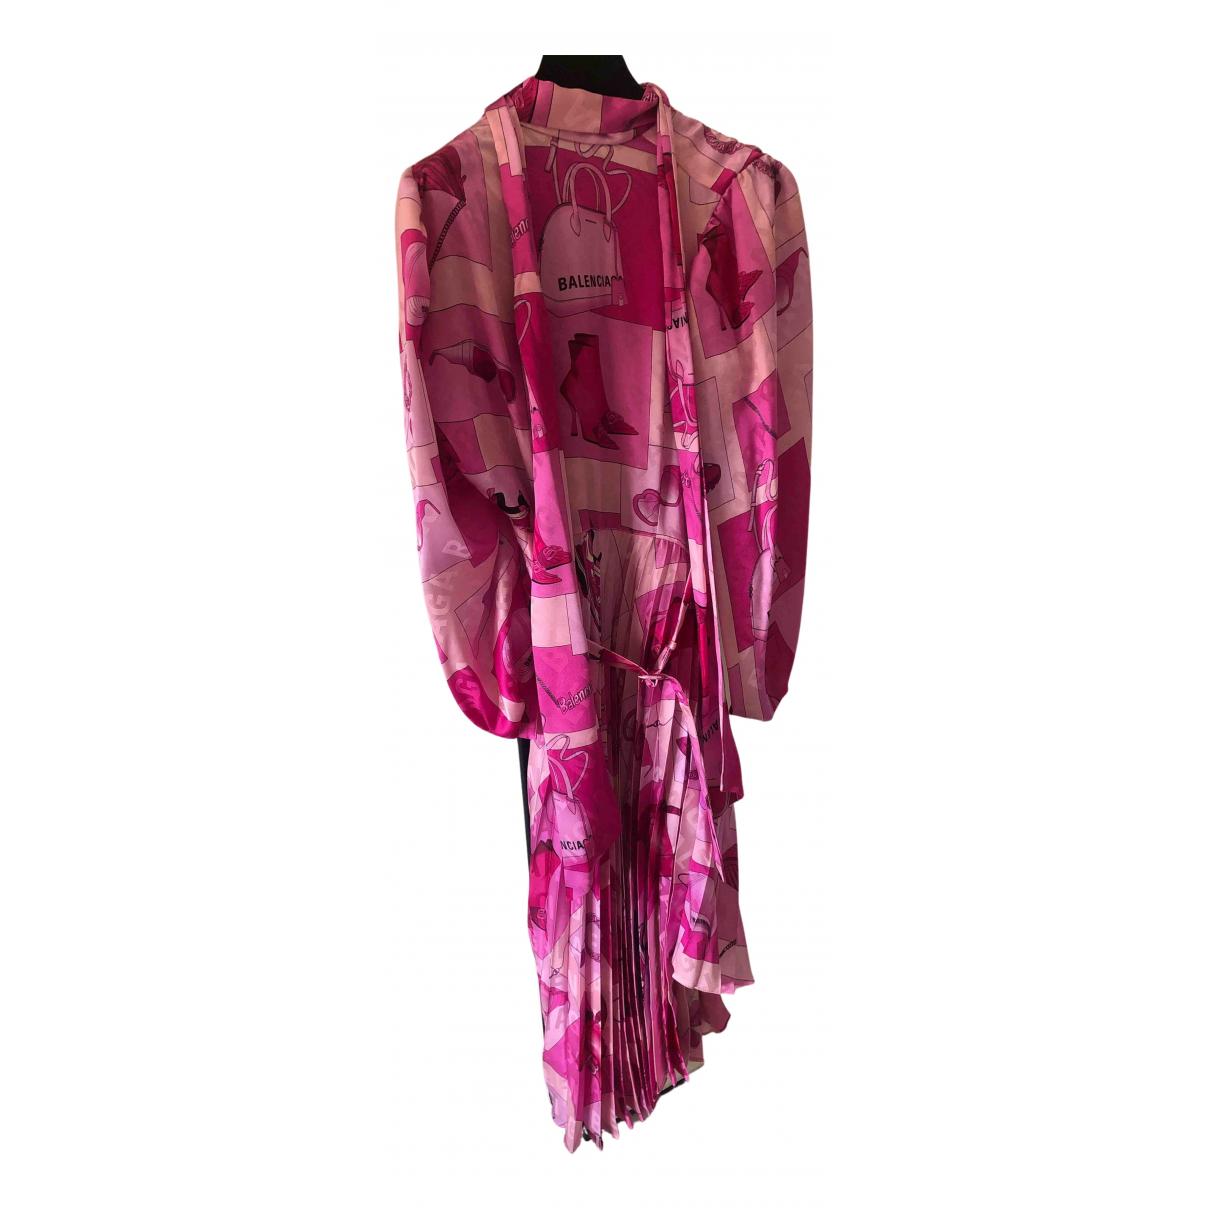 Balenciaga N Pink Silk dress for Women 36 IT